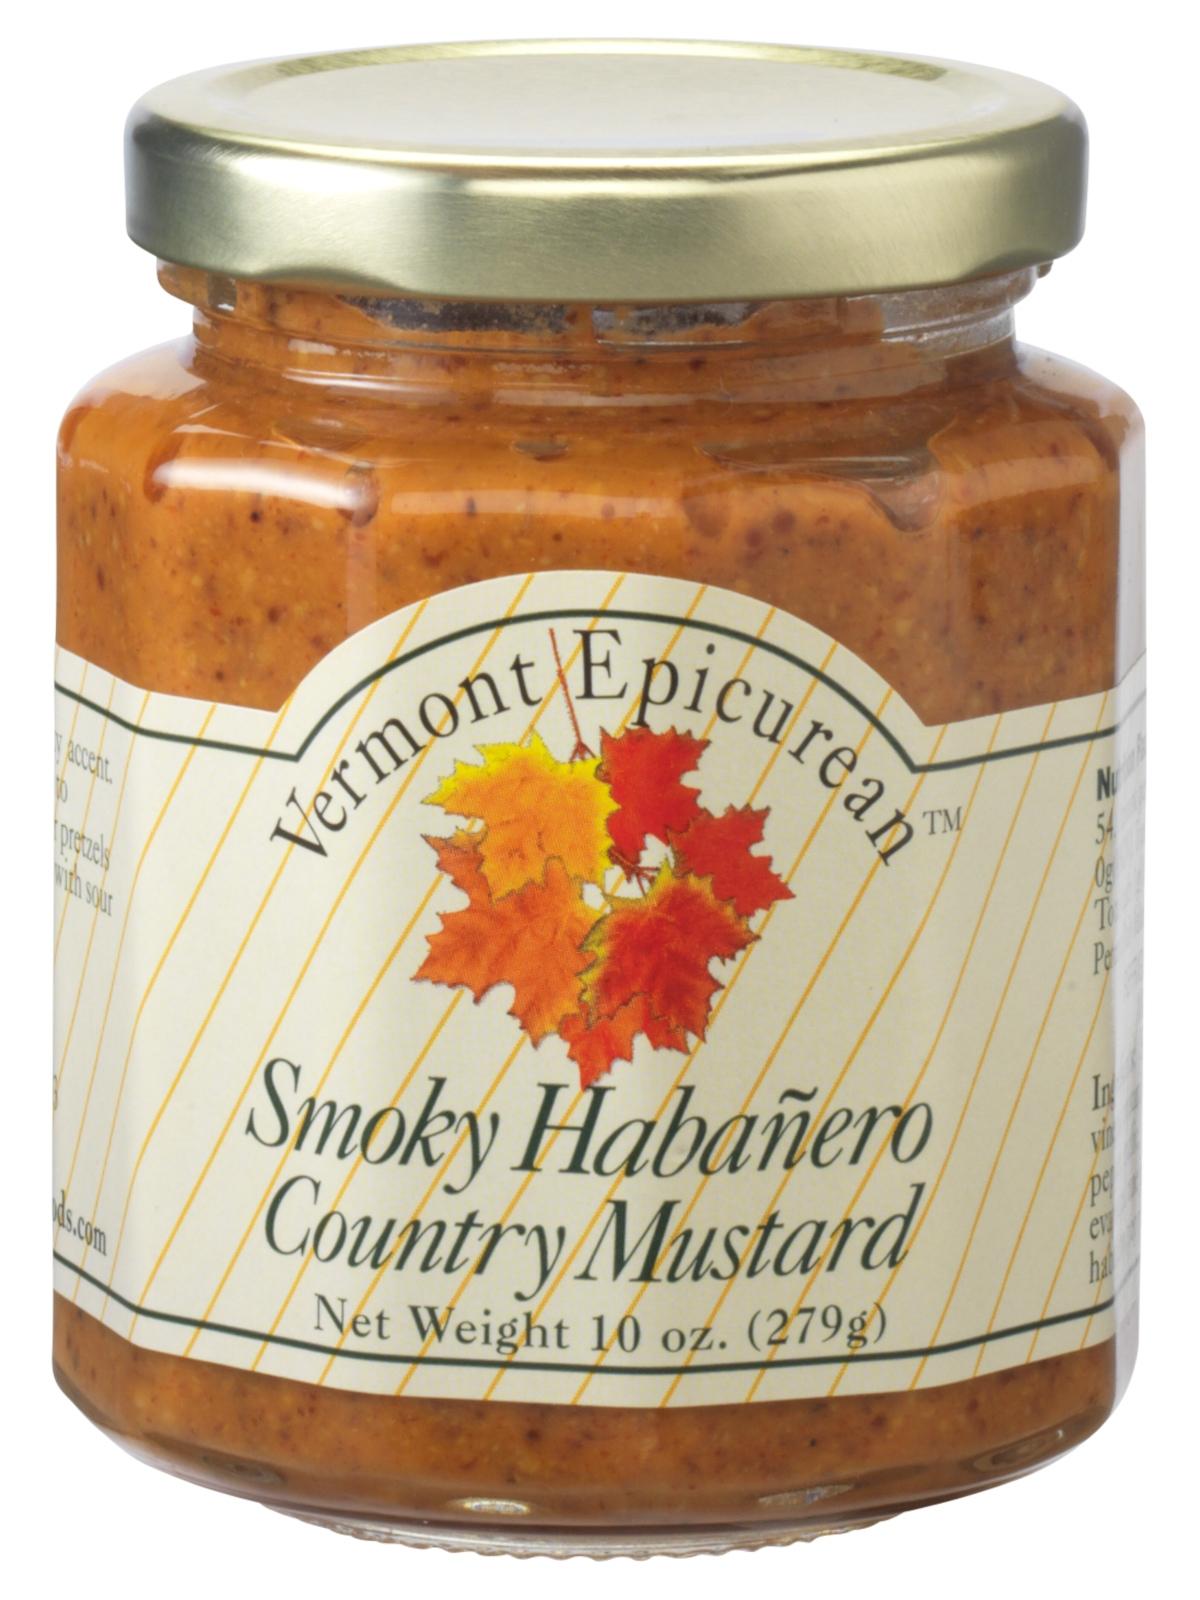 Vermont Epicurean Smokey Habanero Country Mustard